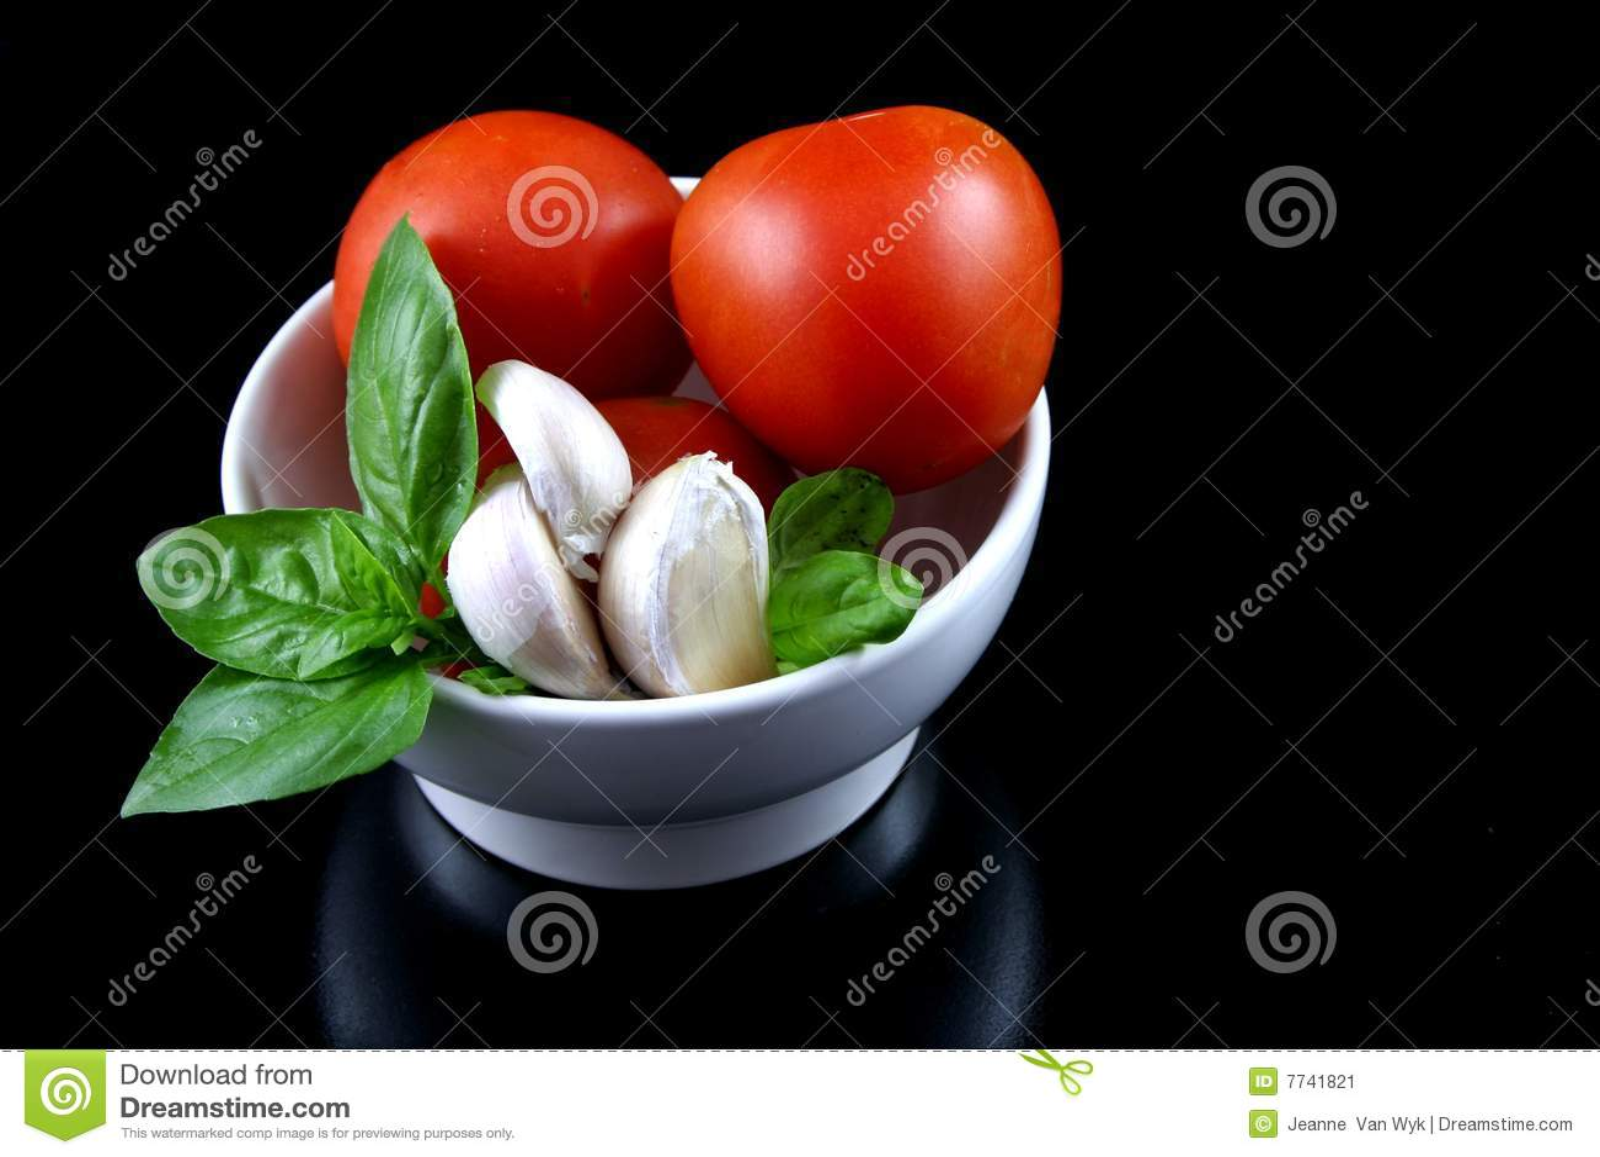 tomate basilikum knoblauch 3 stockbild bild 7741821. Black Bedroom Furniture Sets. Home Design Ideas